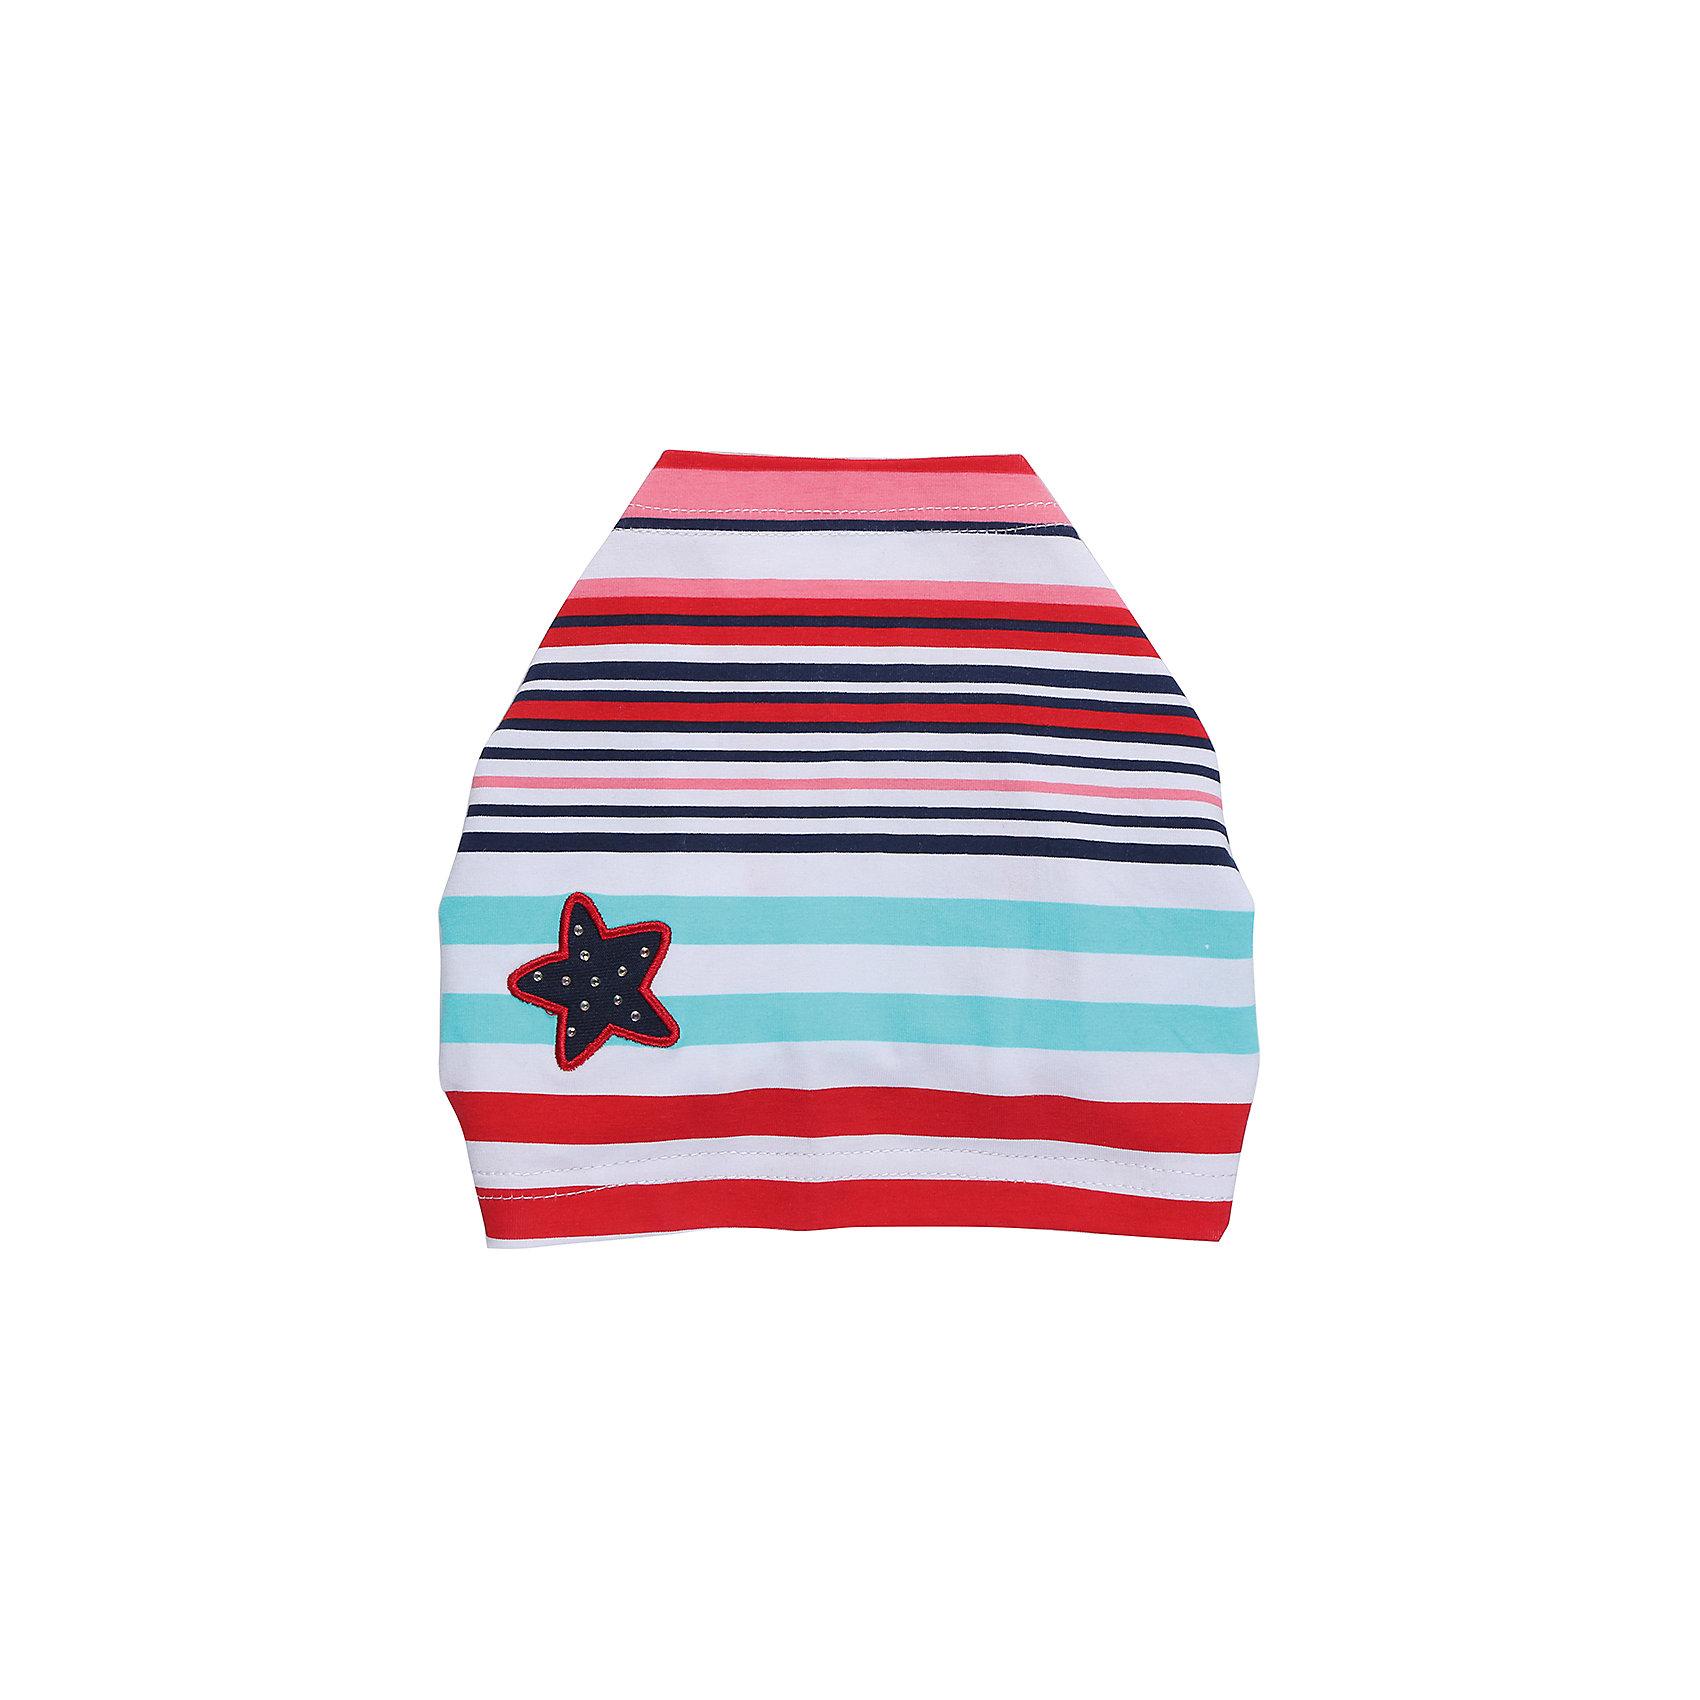 Повязка на голову для девочки Sweet BerryТрикотажная  повязка из принтованной ткани для девочки декорированная вышивкой.<br>Состав:<br>95%хлопок 5%эластан<br><br>Ширина мм: 89<br>Глубина мм: 117<br>Высота мм: 44<br>Вес г: 155<br>Цвет: разноцветный<br>Возраст от месяцев: 24<br>Возраст до месяцев: 36<br>Пол: Женский<br>Возраст: Детский<br>Размер: 50,52,54<br>SKU: 5411852